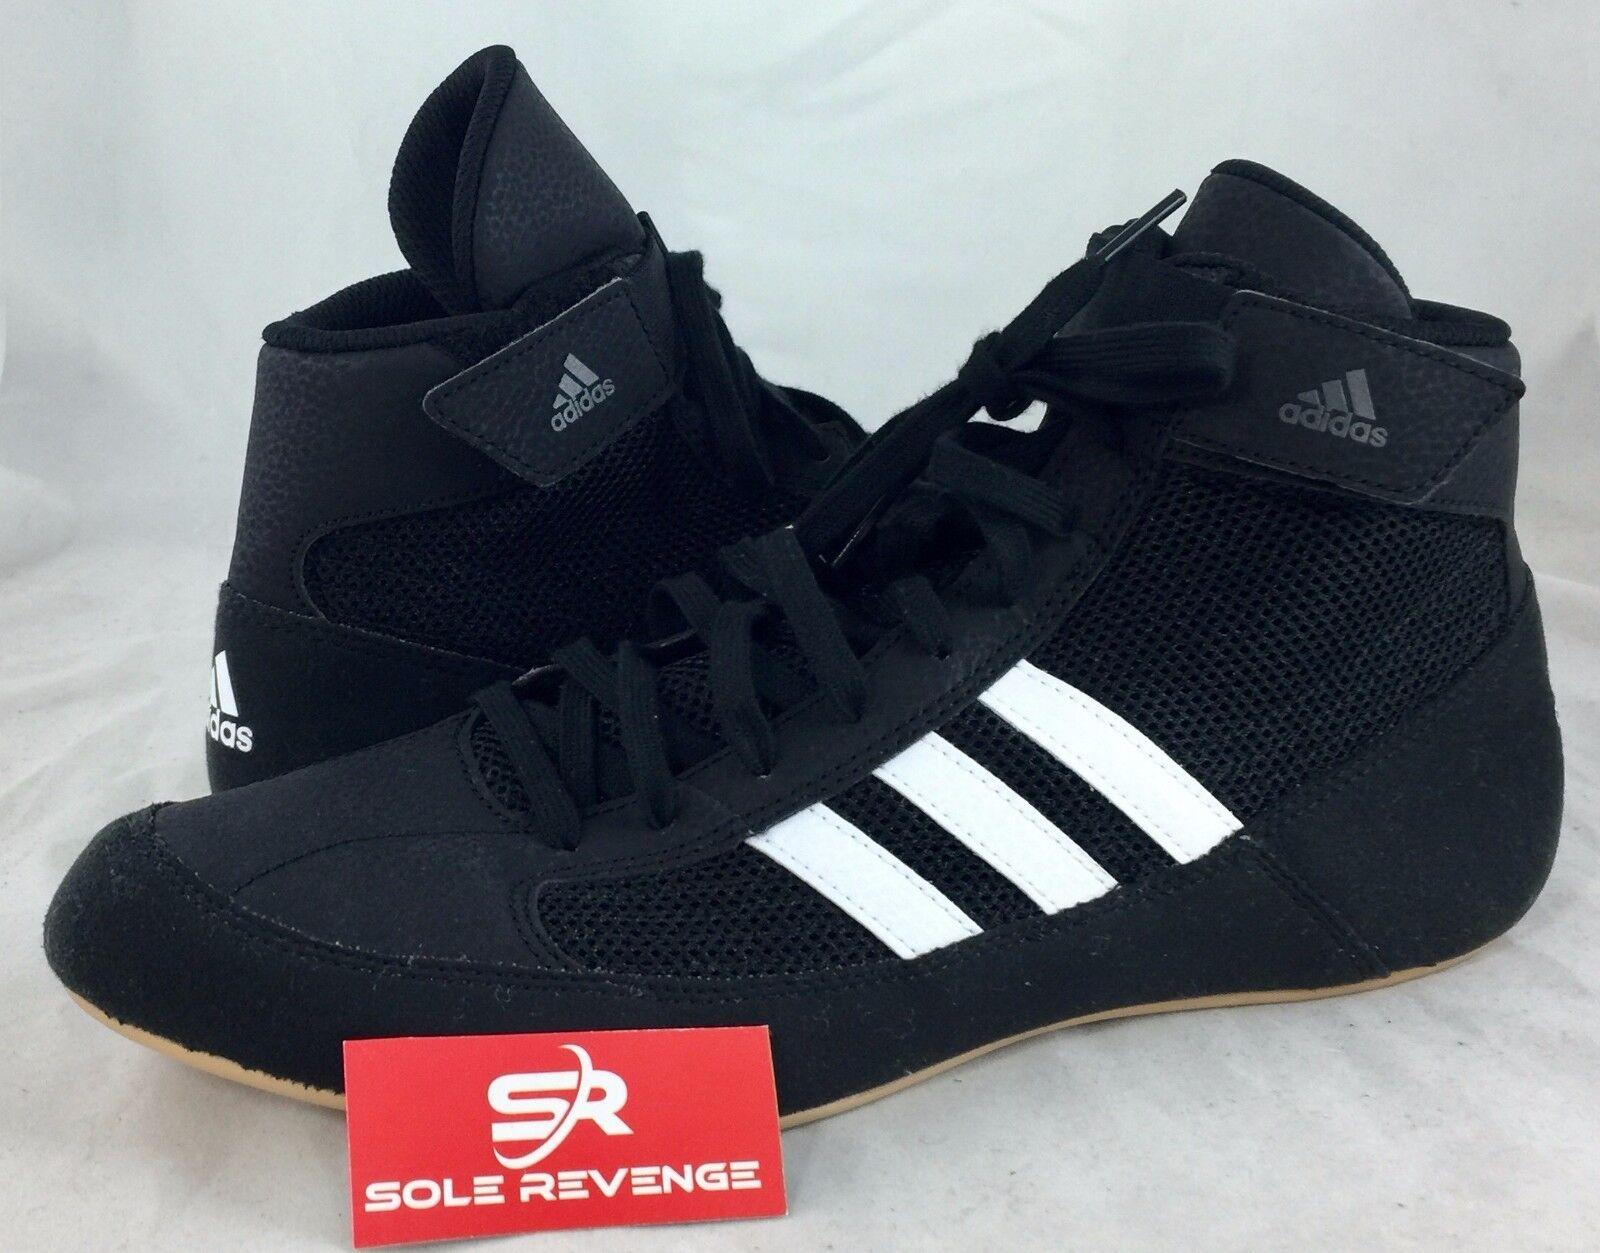 New ADIDAS HVC 2 Wrestling shoes MMA Boxing Black White Gum AQ3325